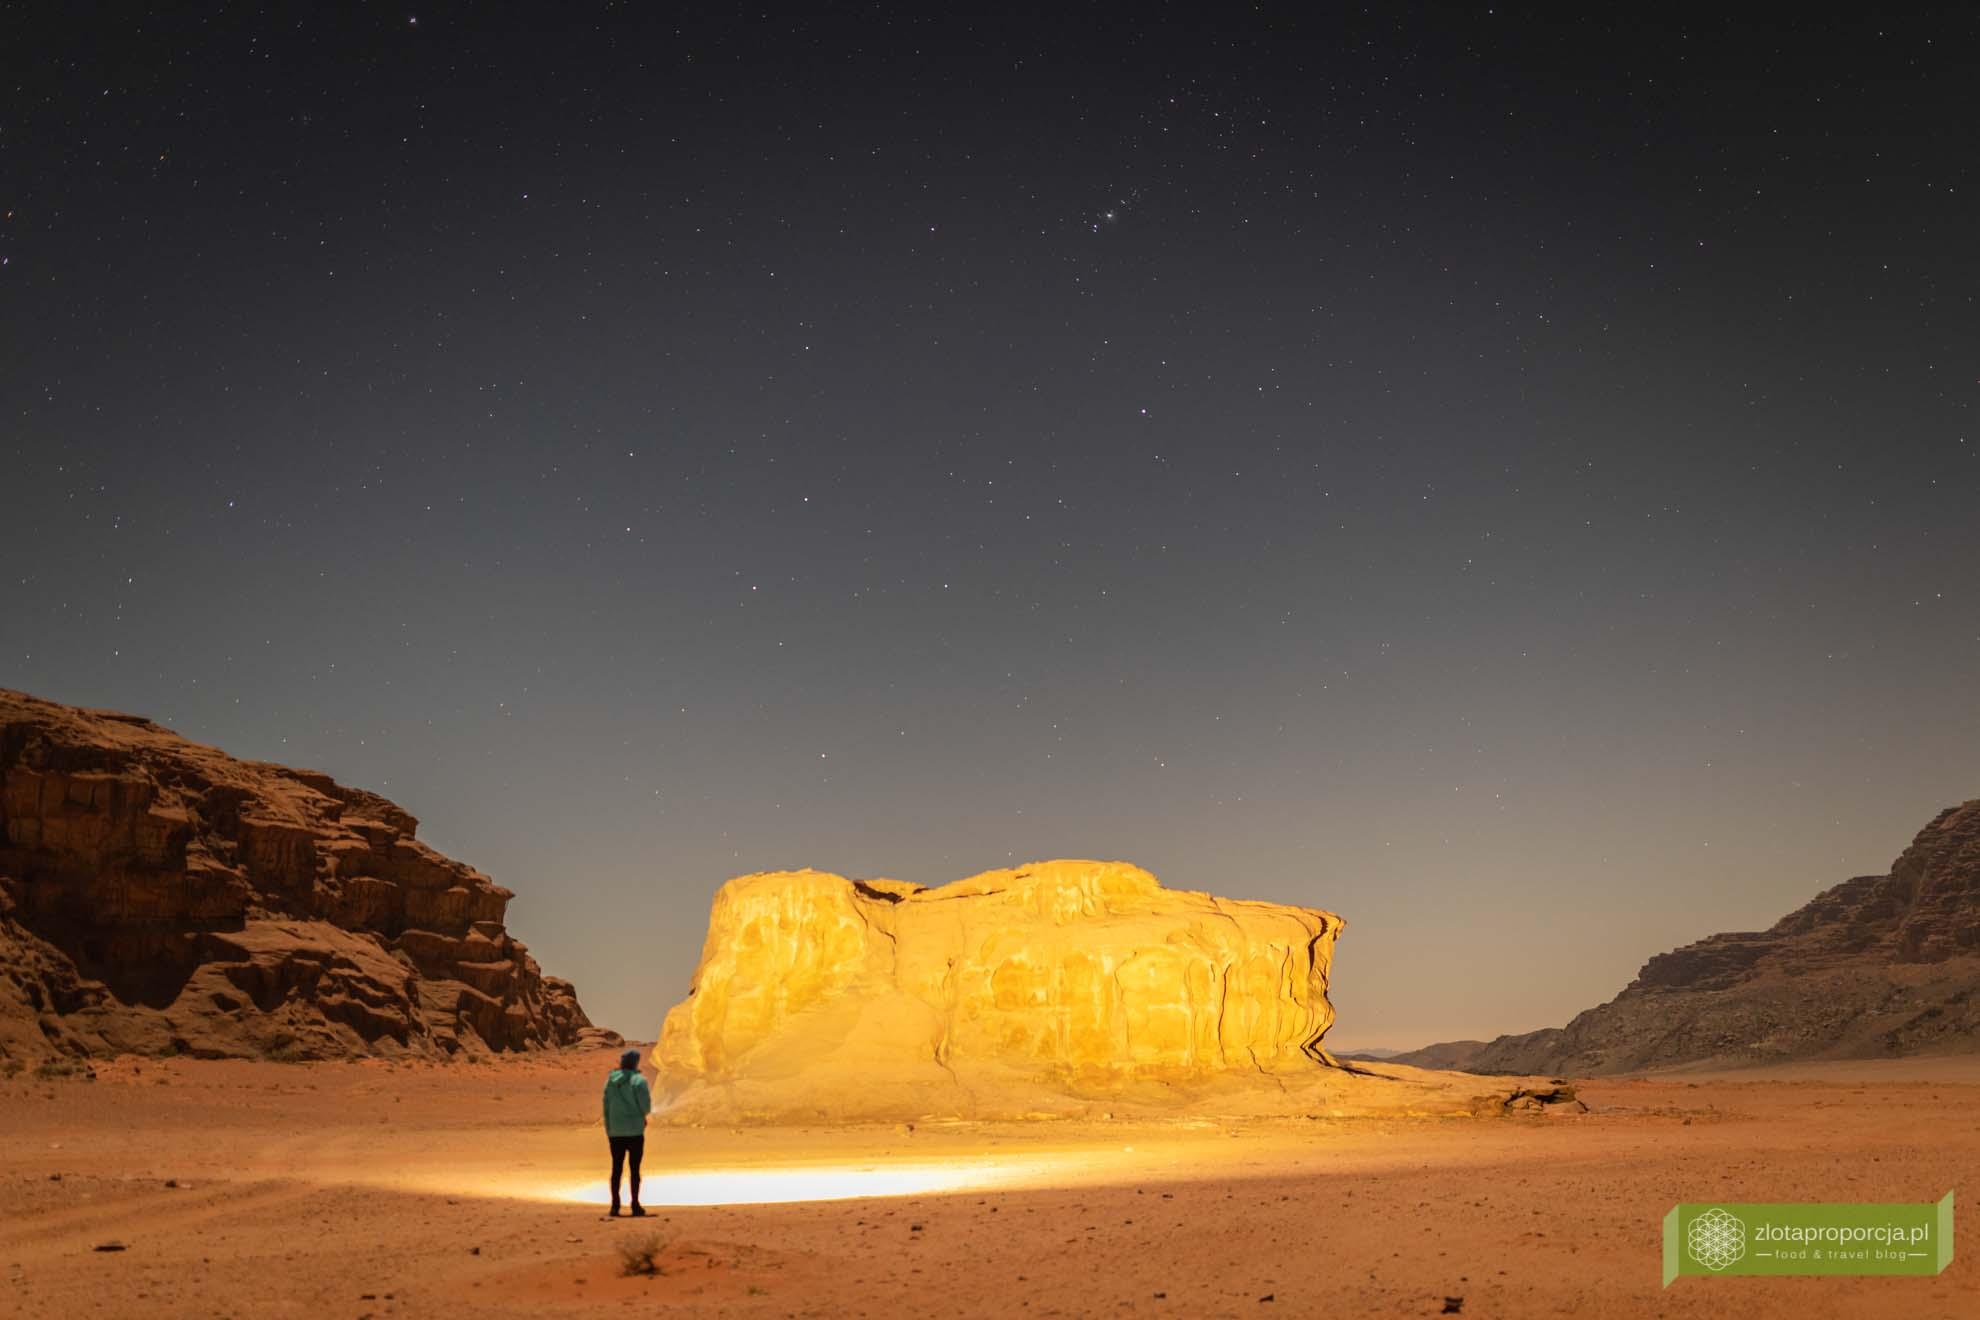 Wadi Rum, pustynia Wadi Rum, Jordania, pustynia Jordania; Wadi rum wycieczka, Wadi Rum zwiedzanie, Jordania atrakcje; Wadi Rum nocą, pustynia nocą, Wadi Rum gwiazdy, Wadi Rum niebo;